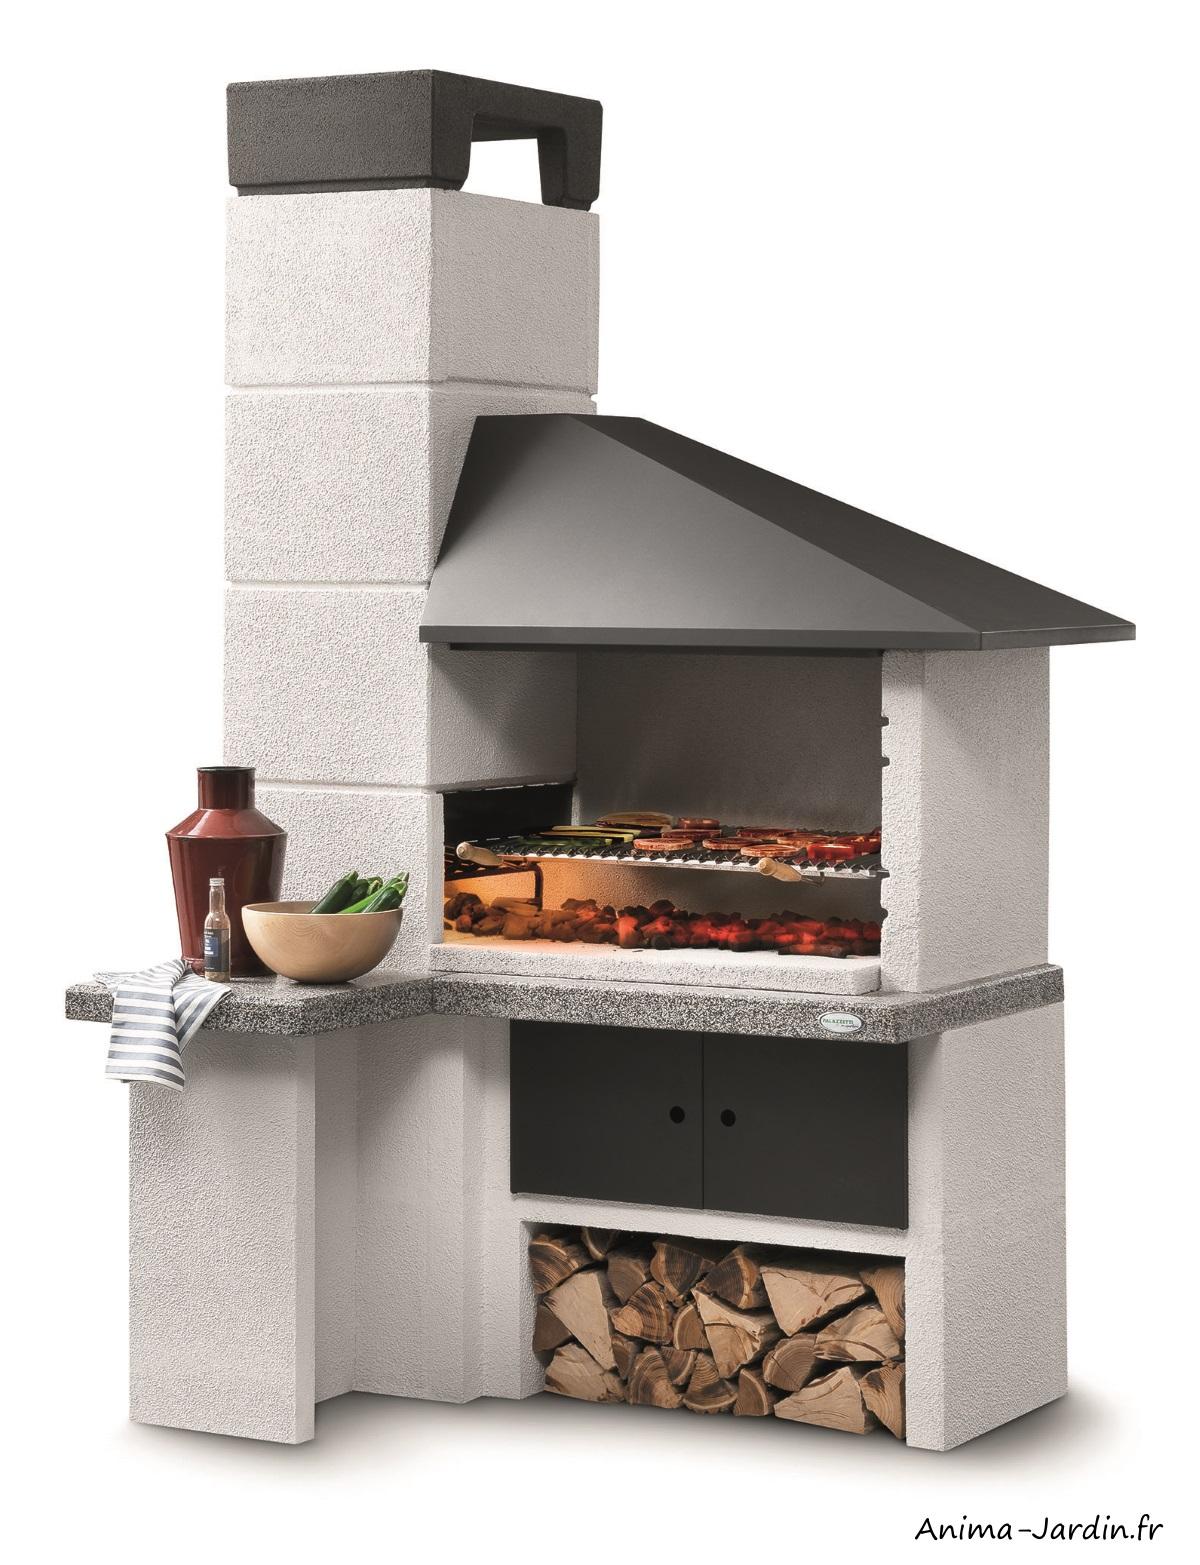 Barbecue en perre-Faro New-design-marmotech-gris-charbon de bois-Palazzetti-Anima-Jardin.fr